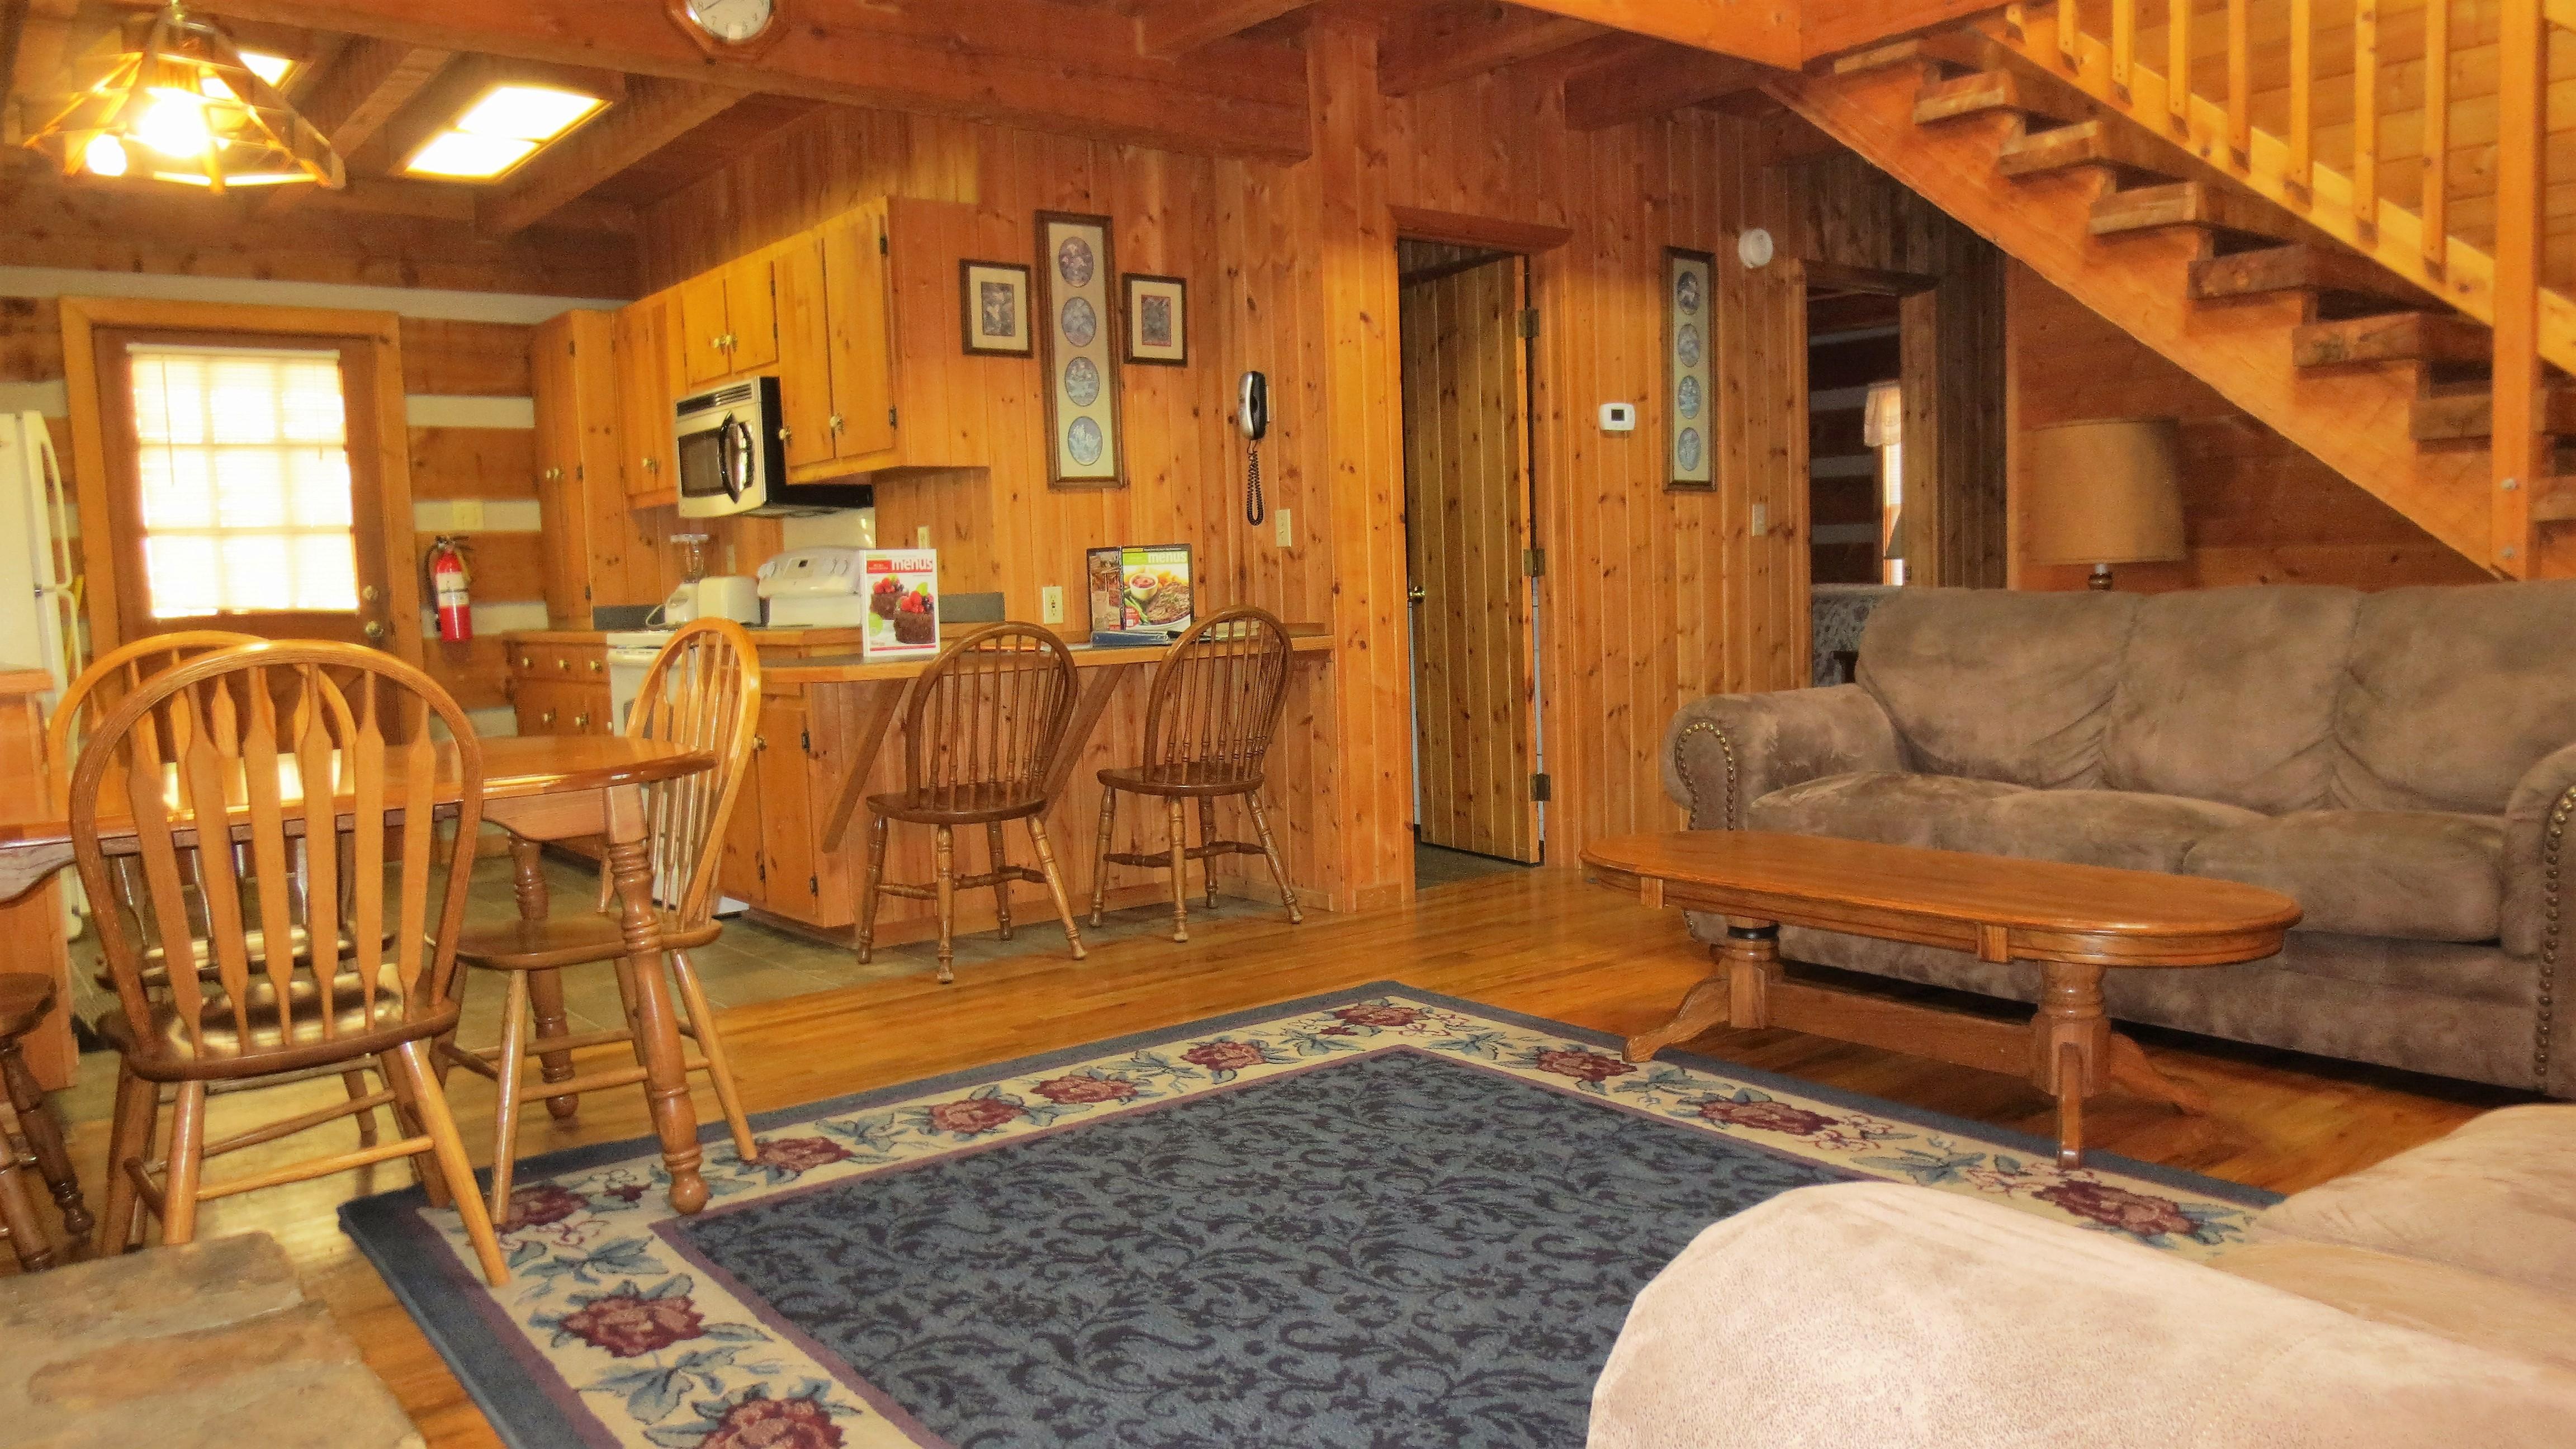 3 bedroom log cabin close to downtown gatlinburg